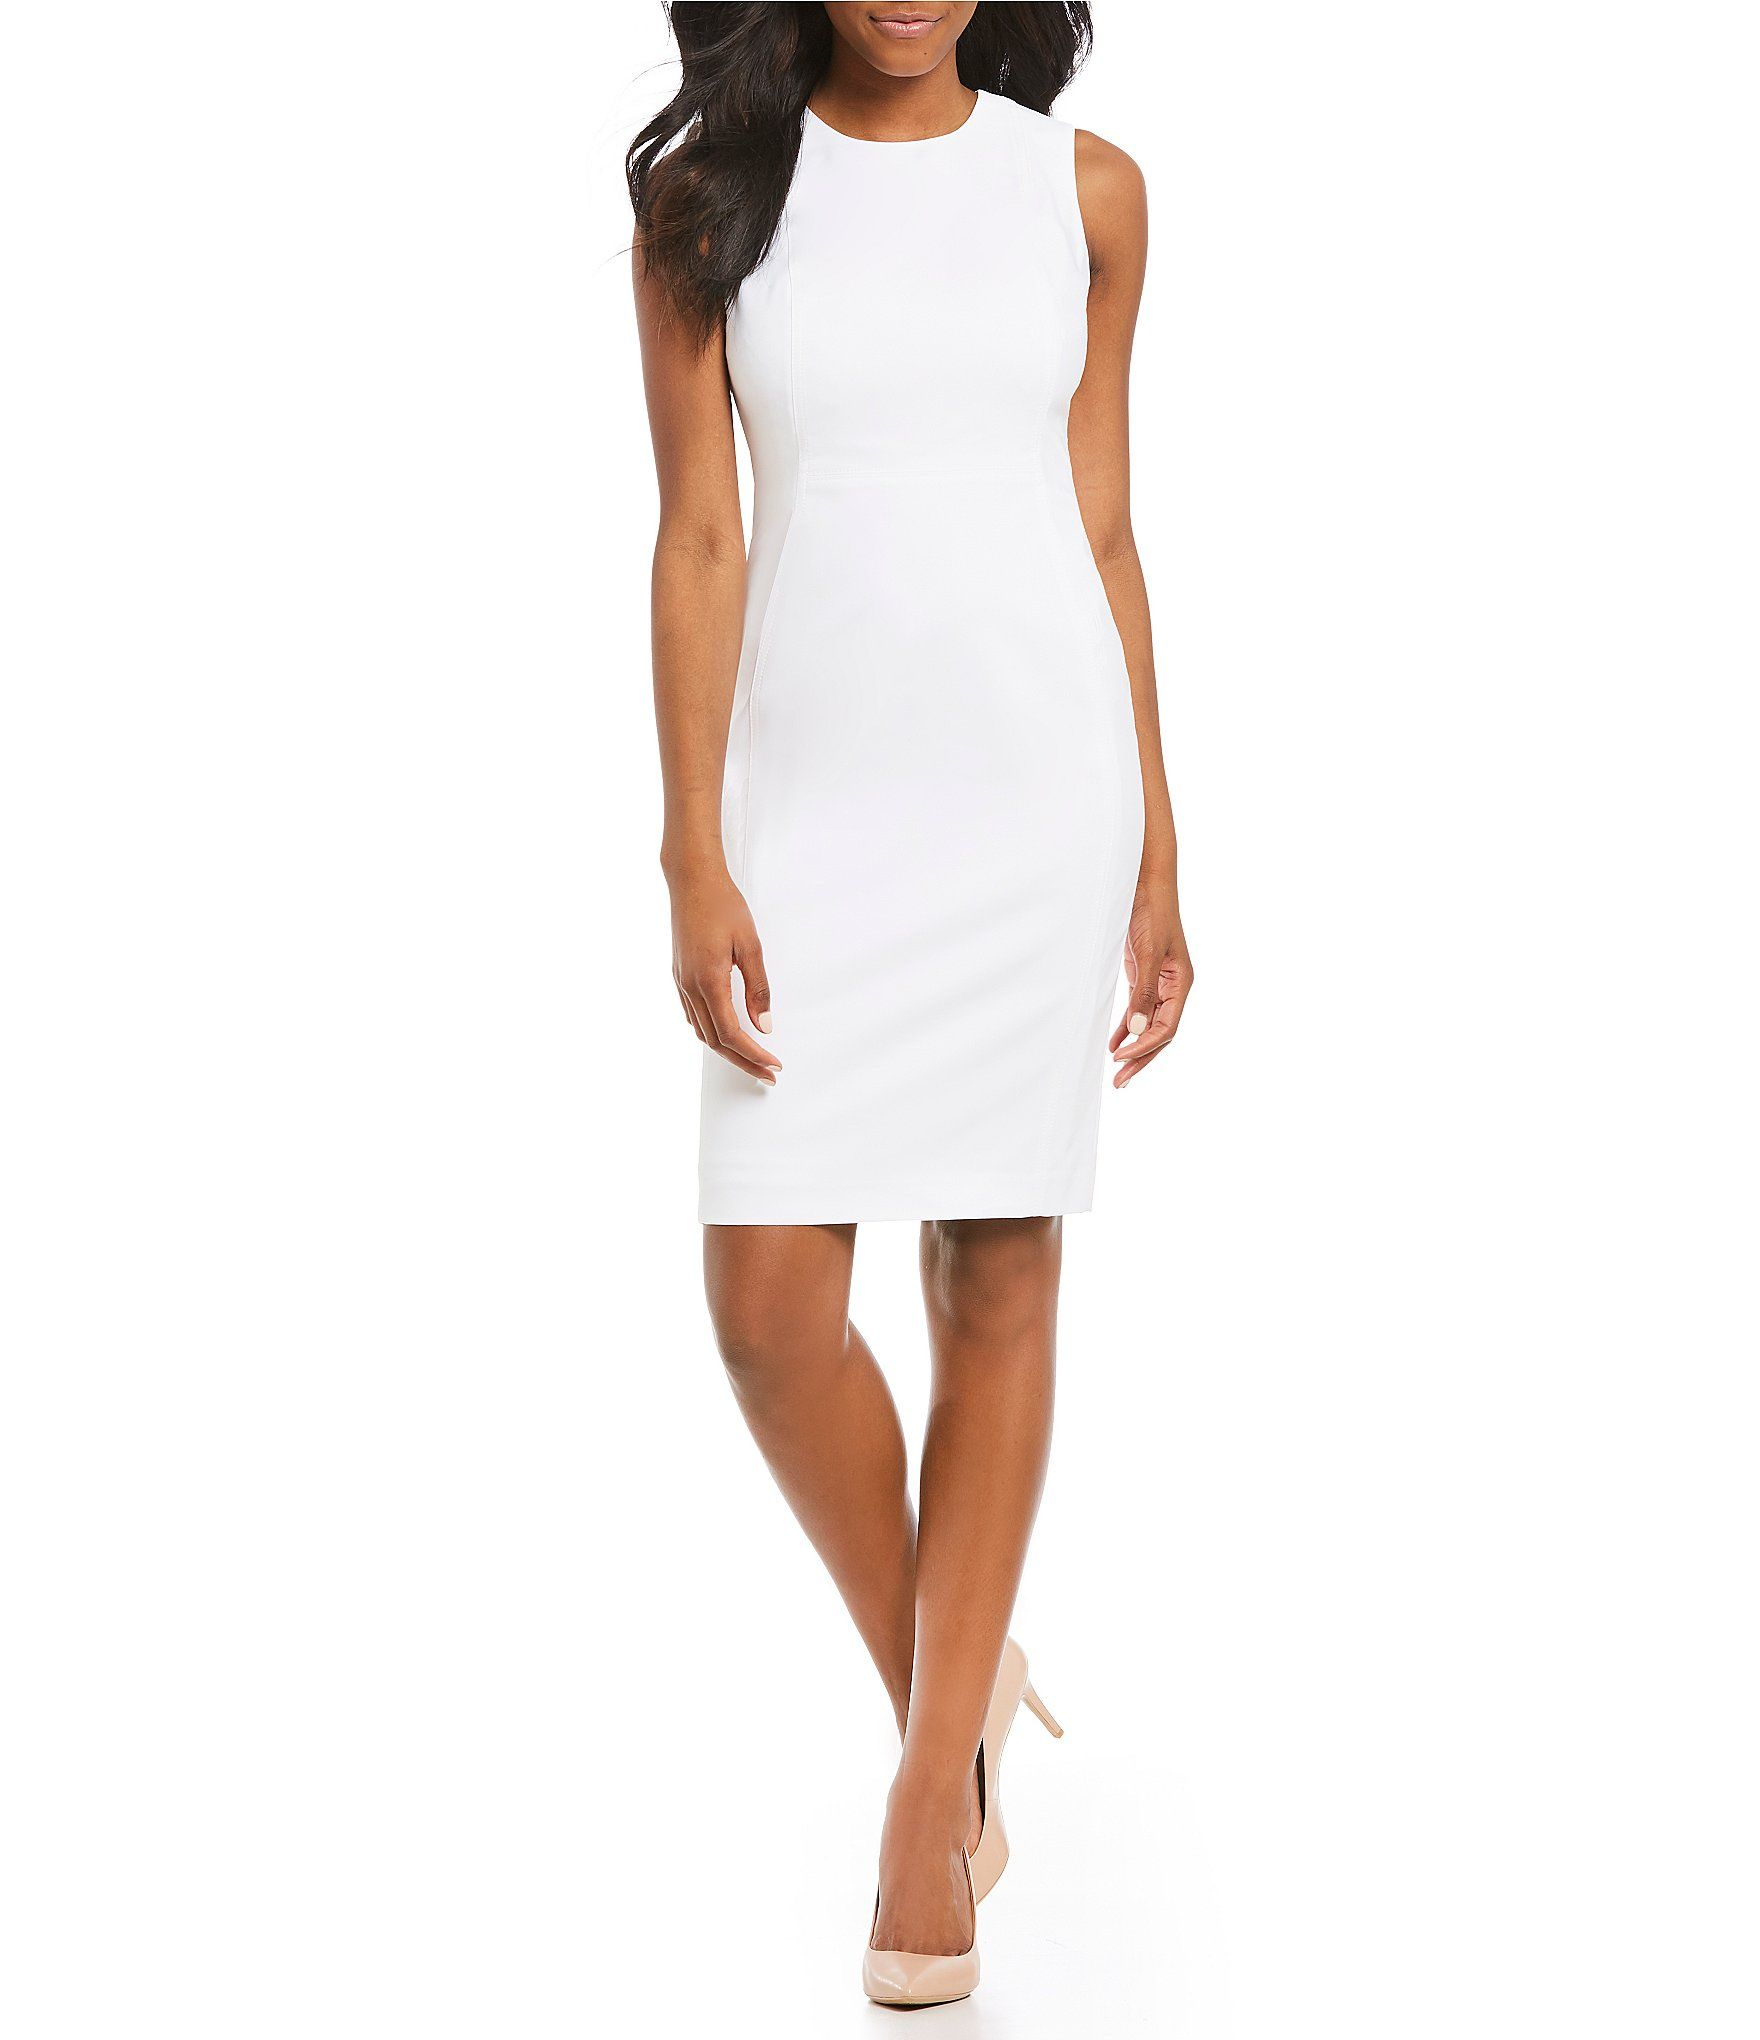 77d5f325932 Shop for Calvin Klein Solid Sleeveless Sheath Dress at Dillards.com. Visit  Dillards.com to find clothing